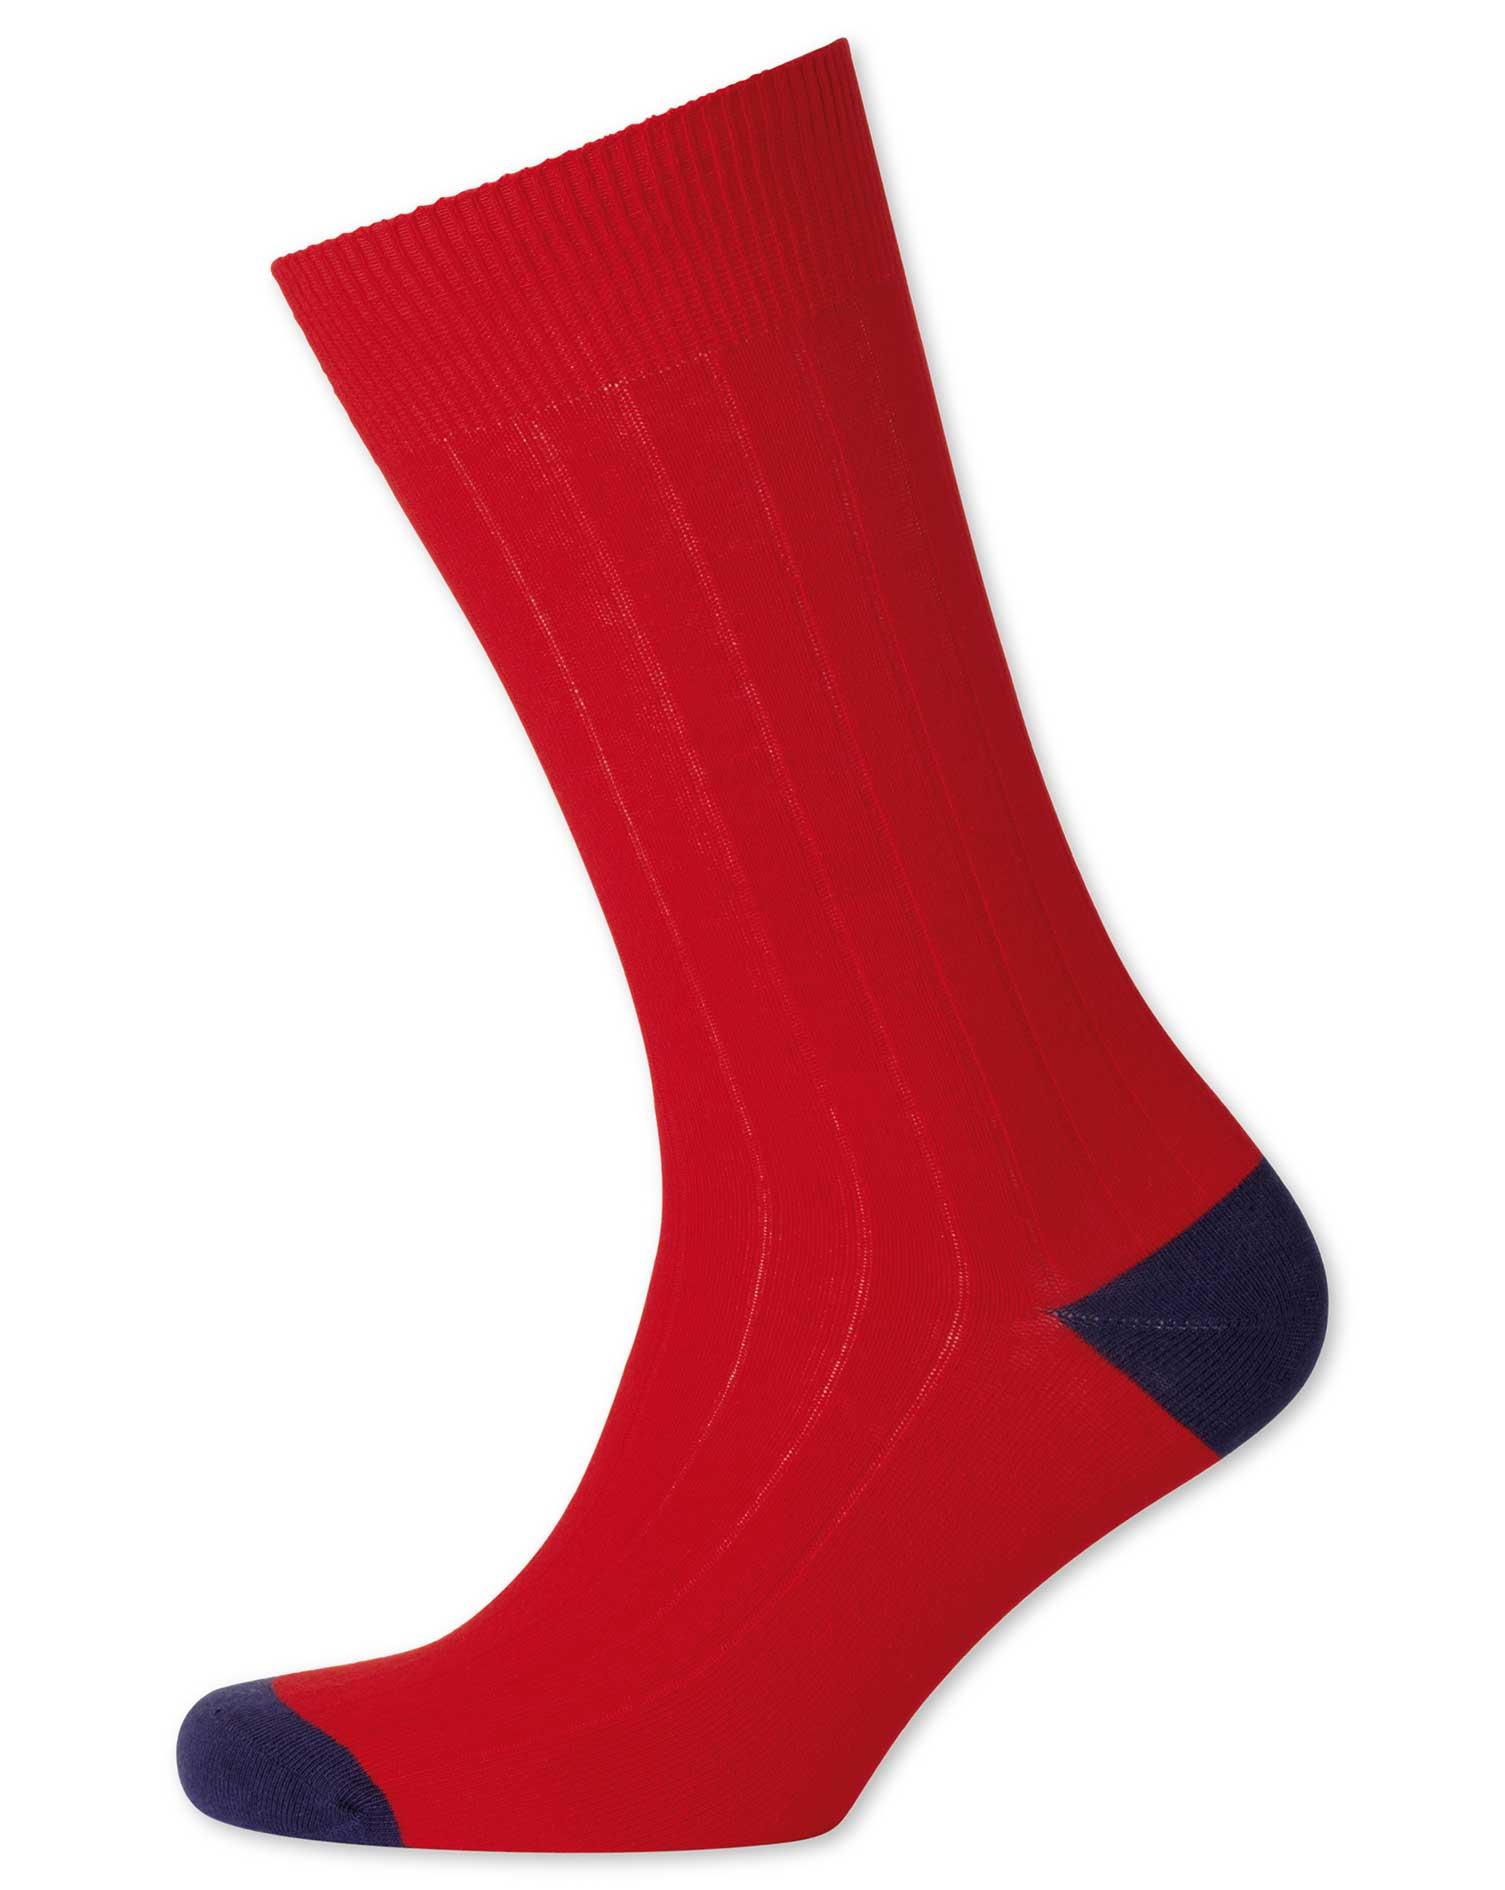 Red Cotton Rib Socks Size Medium by Charles Tyrwhitt